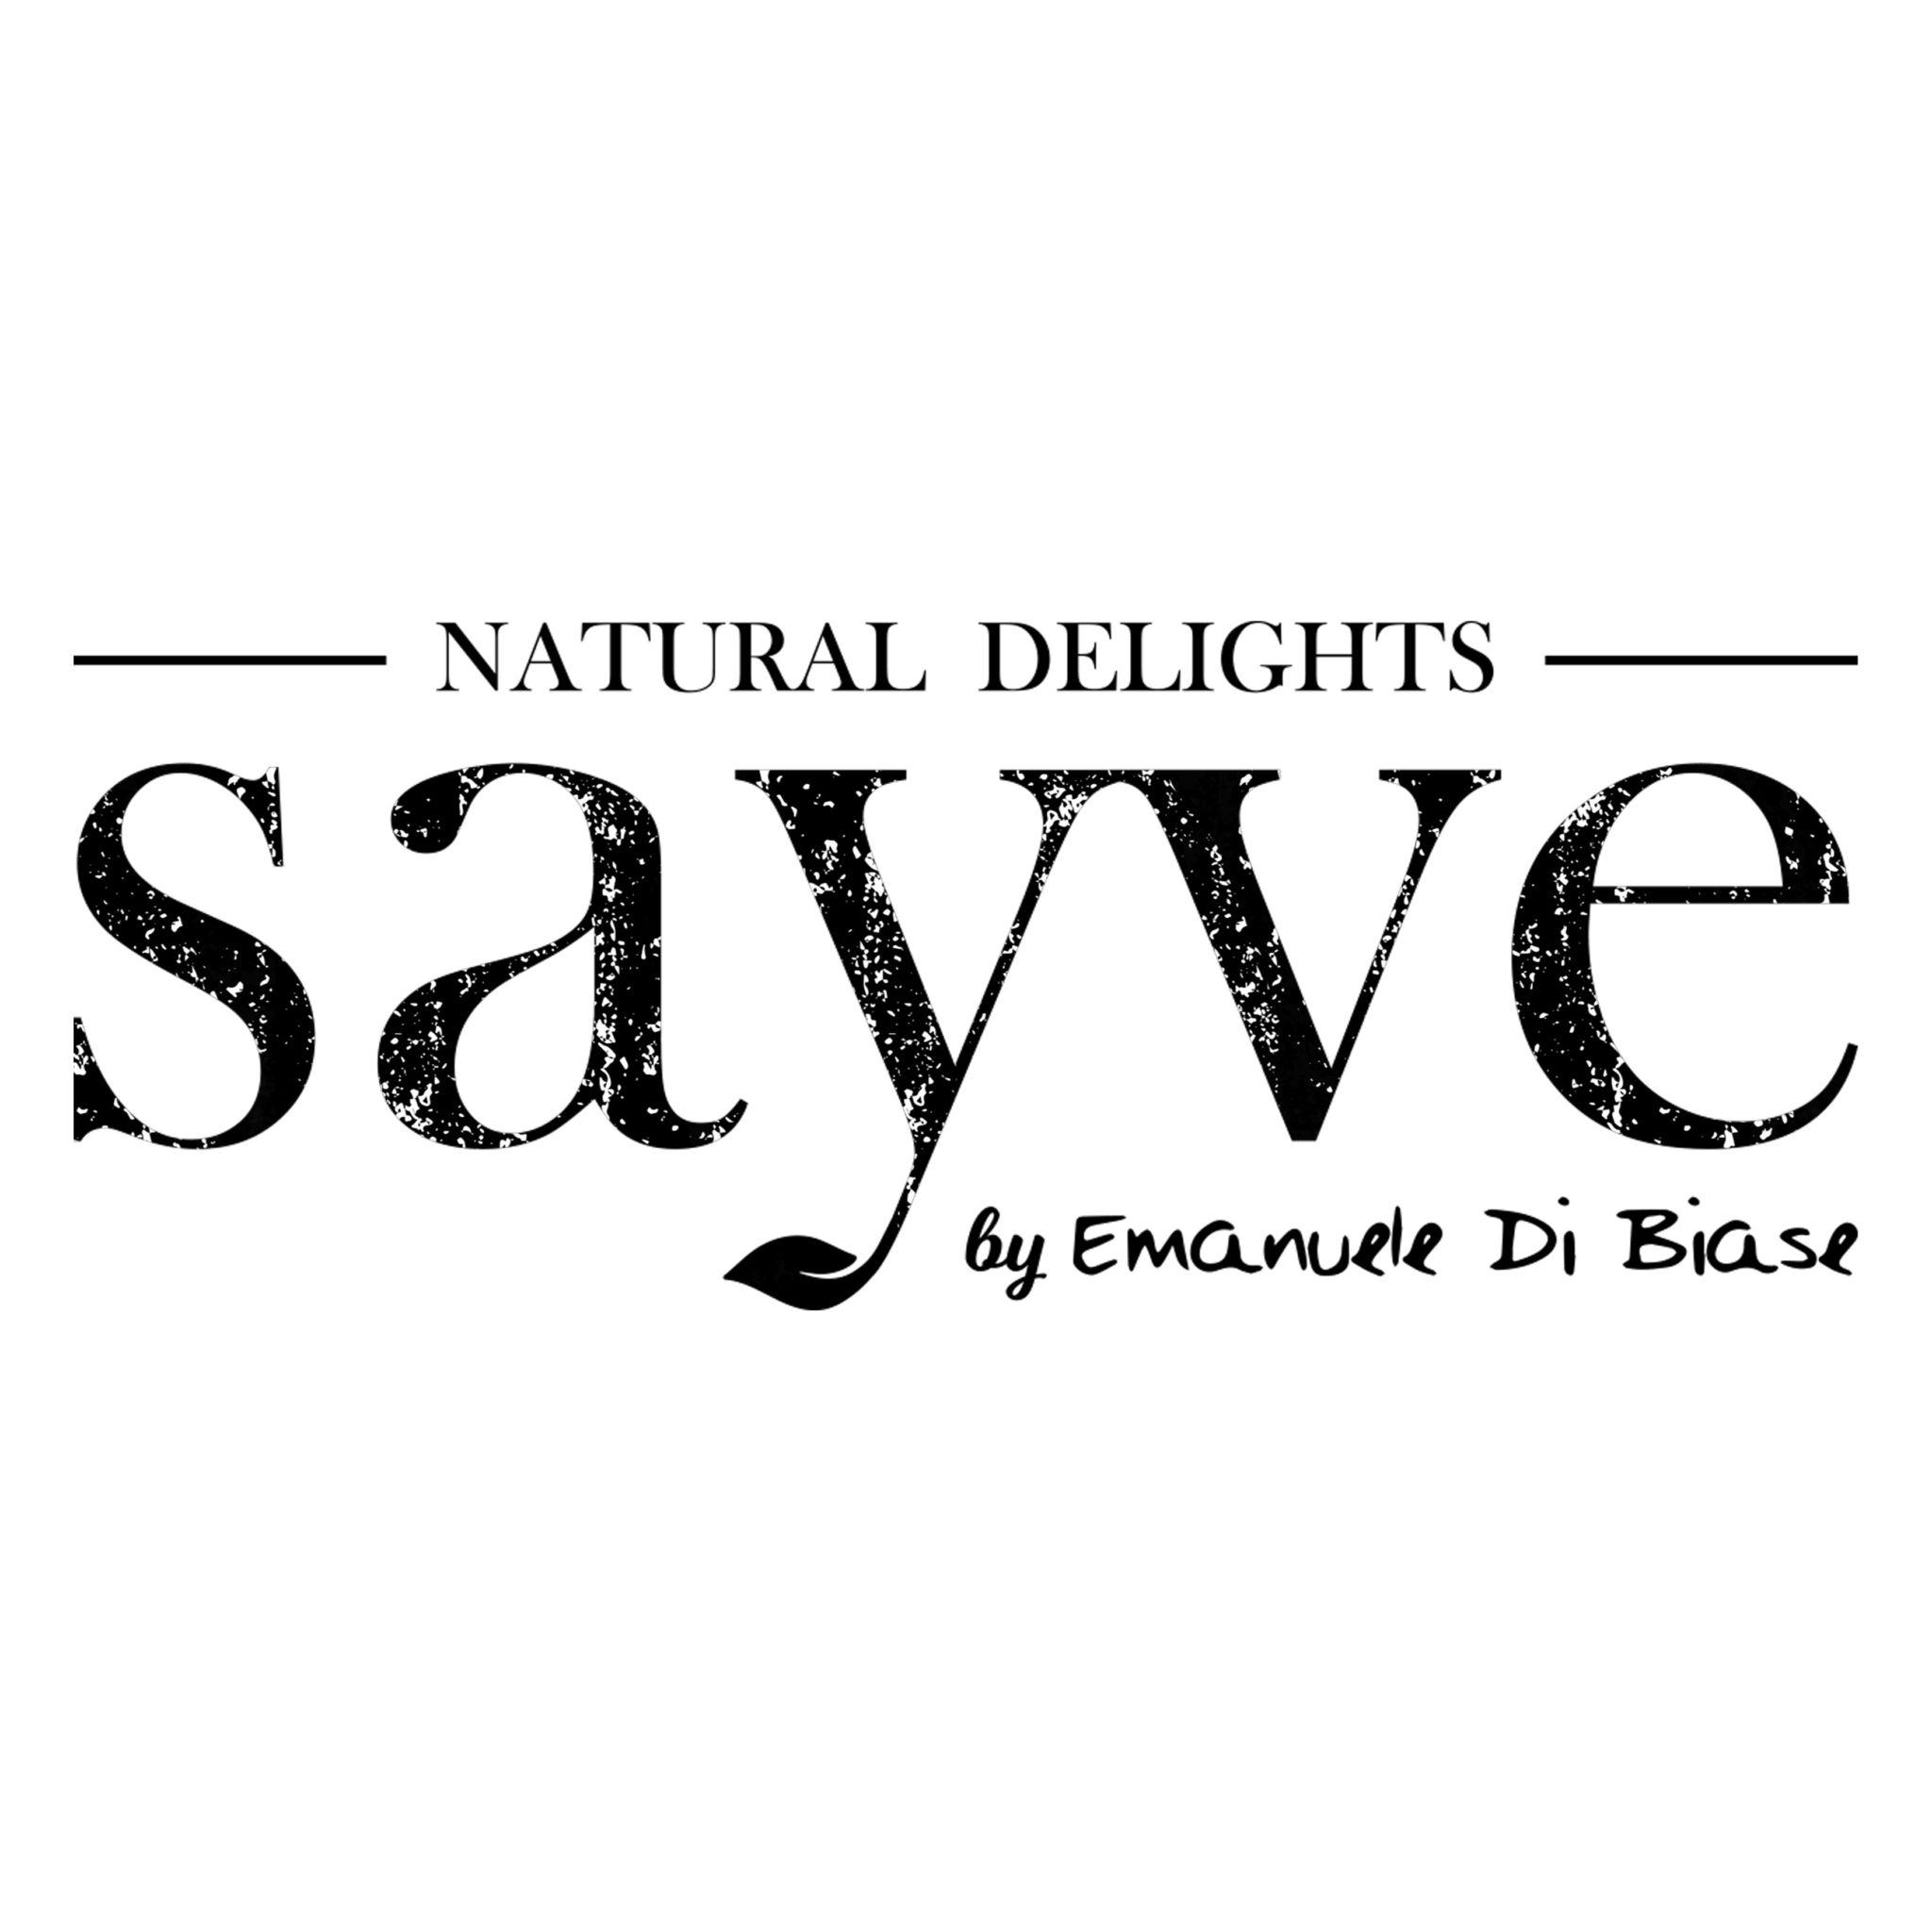 Produse Sayve din oferta Nourish BioMarket